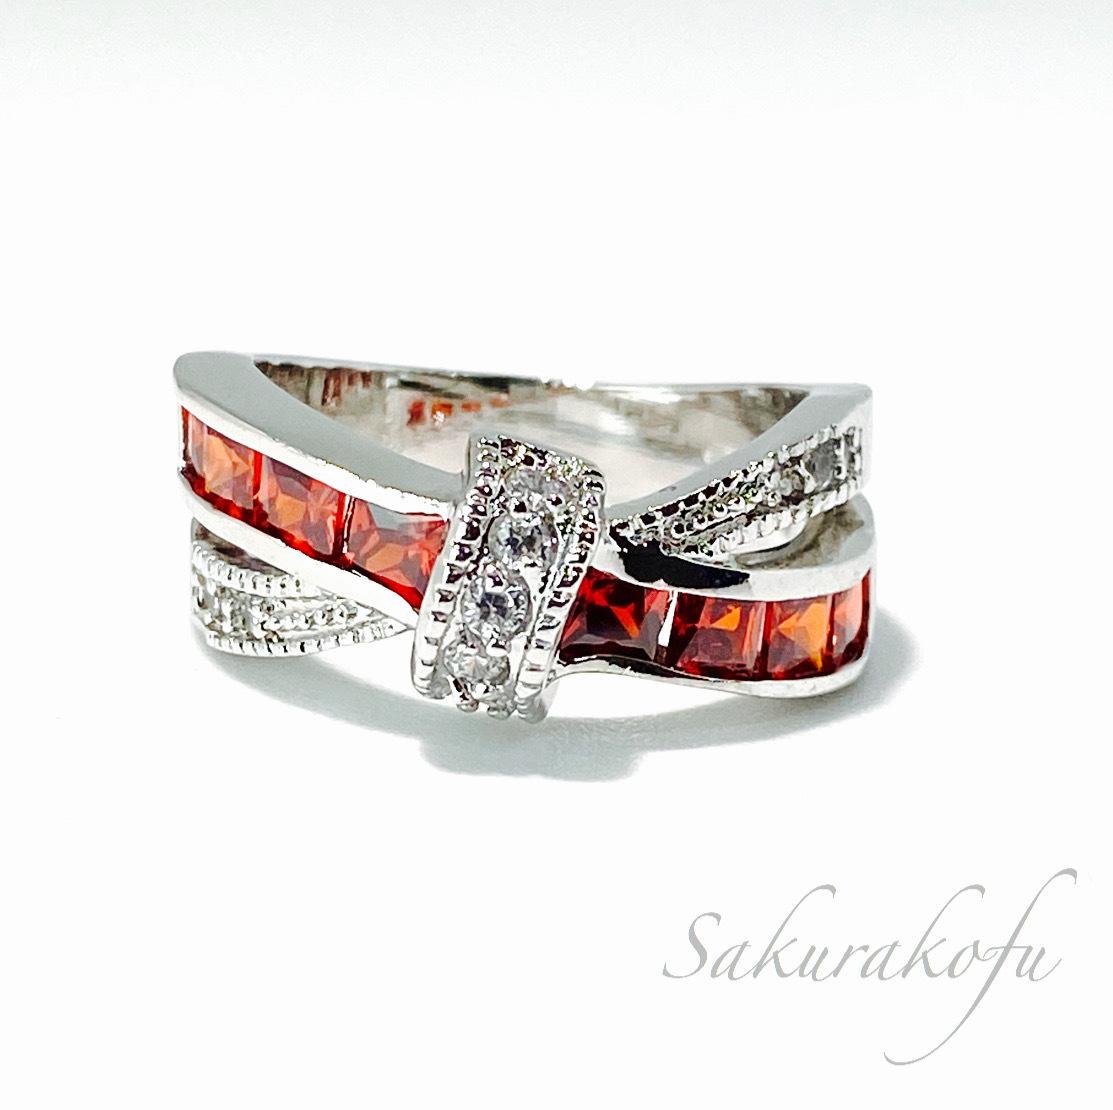 D013A レディース 指輪 ガーネット キュービックジルコニア クロスリボン Cross Ribbon Garnet Ring